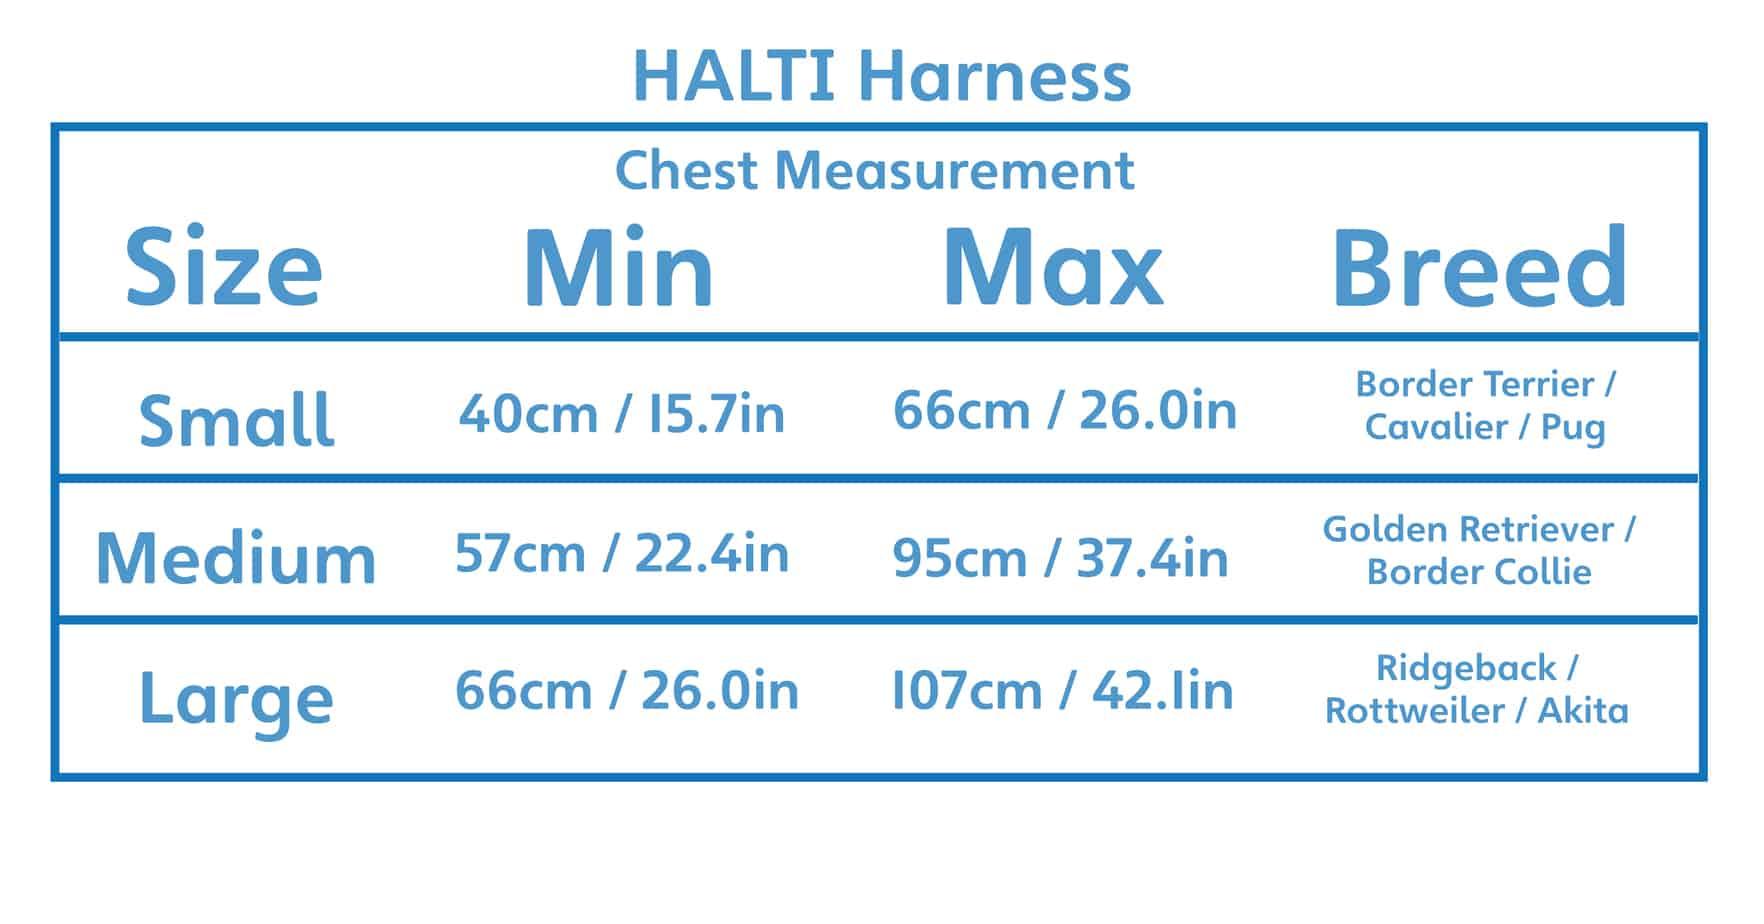 Company of animals halti harness small halti harnesses location nvjuhfo Choice Image